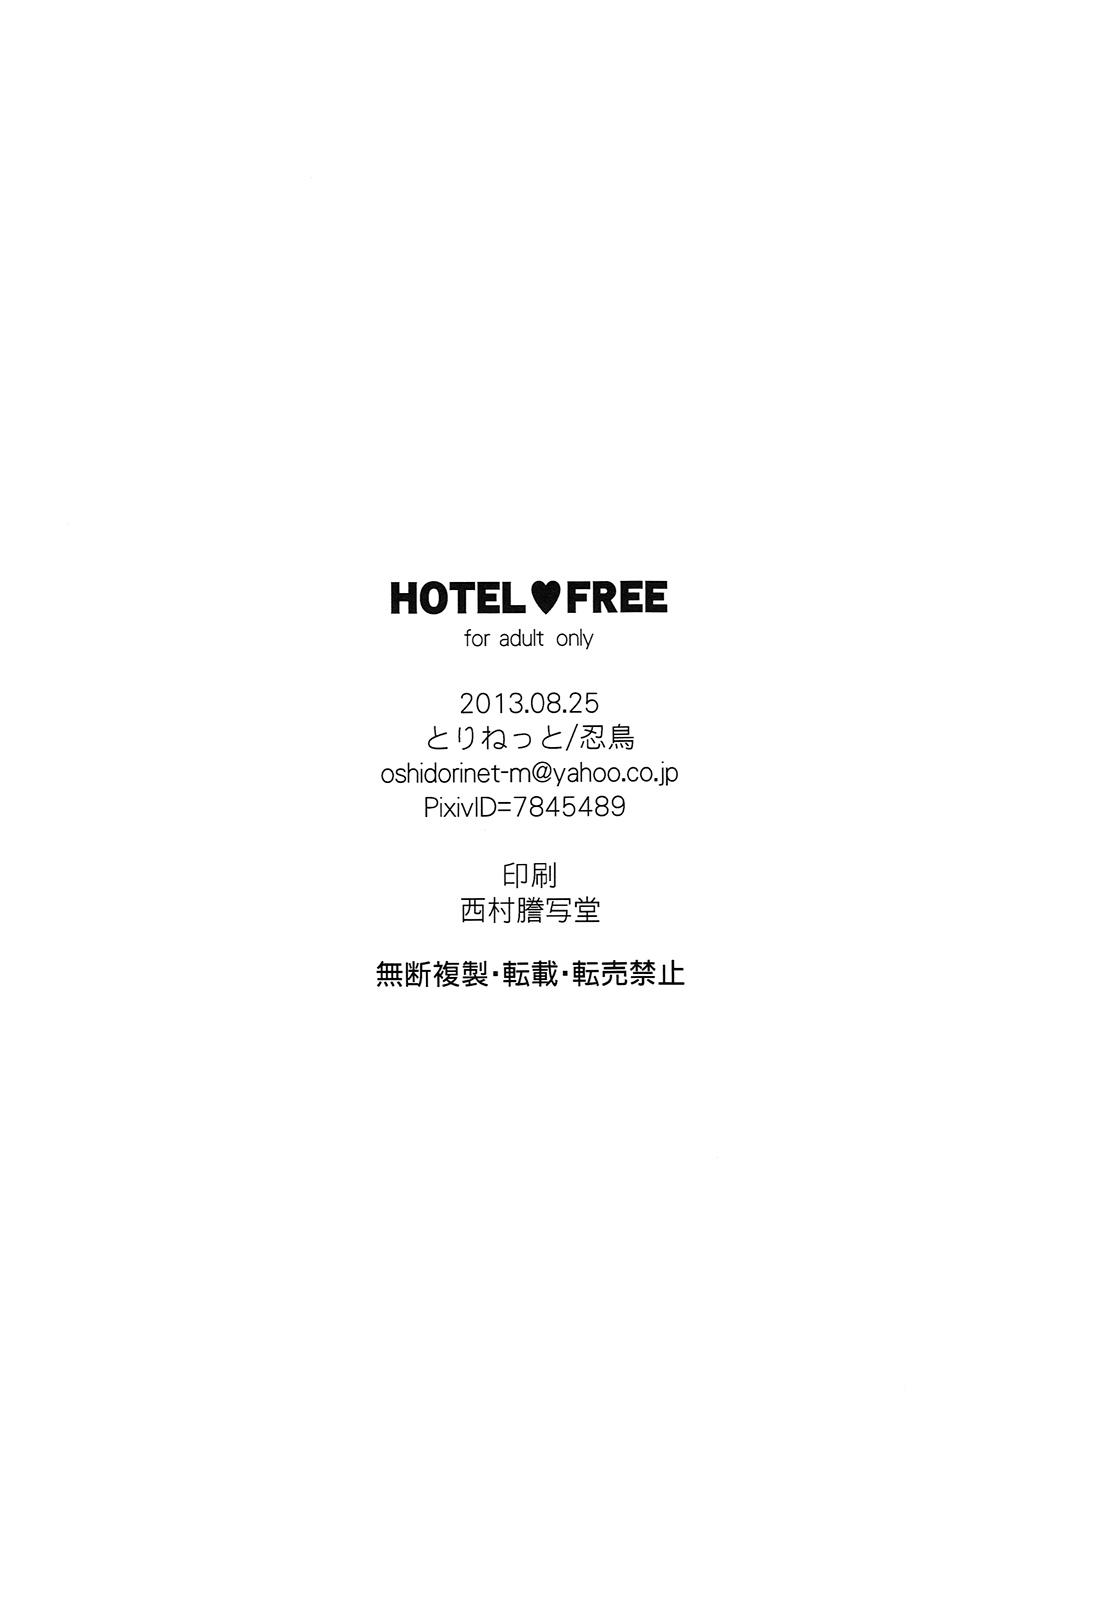 HOTEL FREE 19